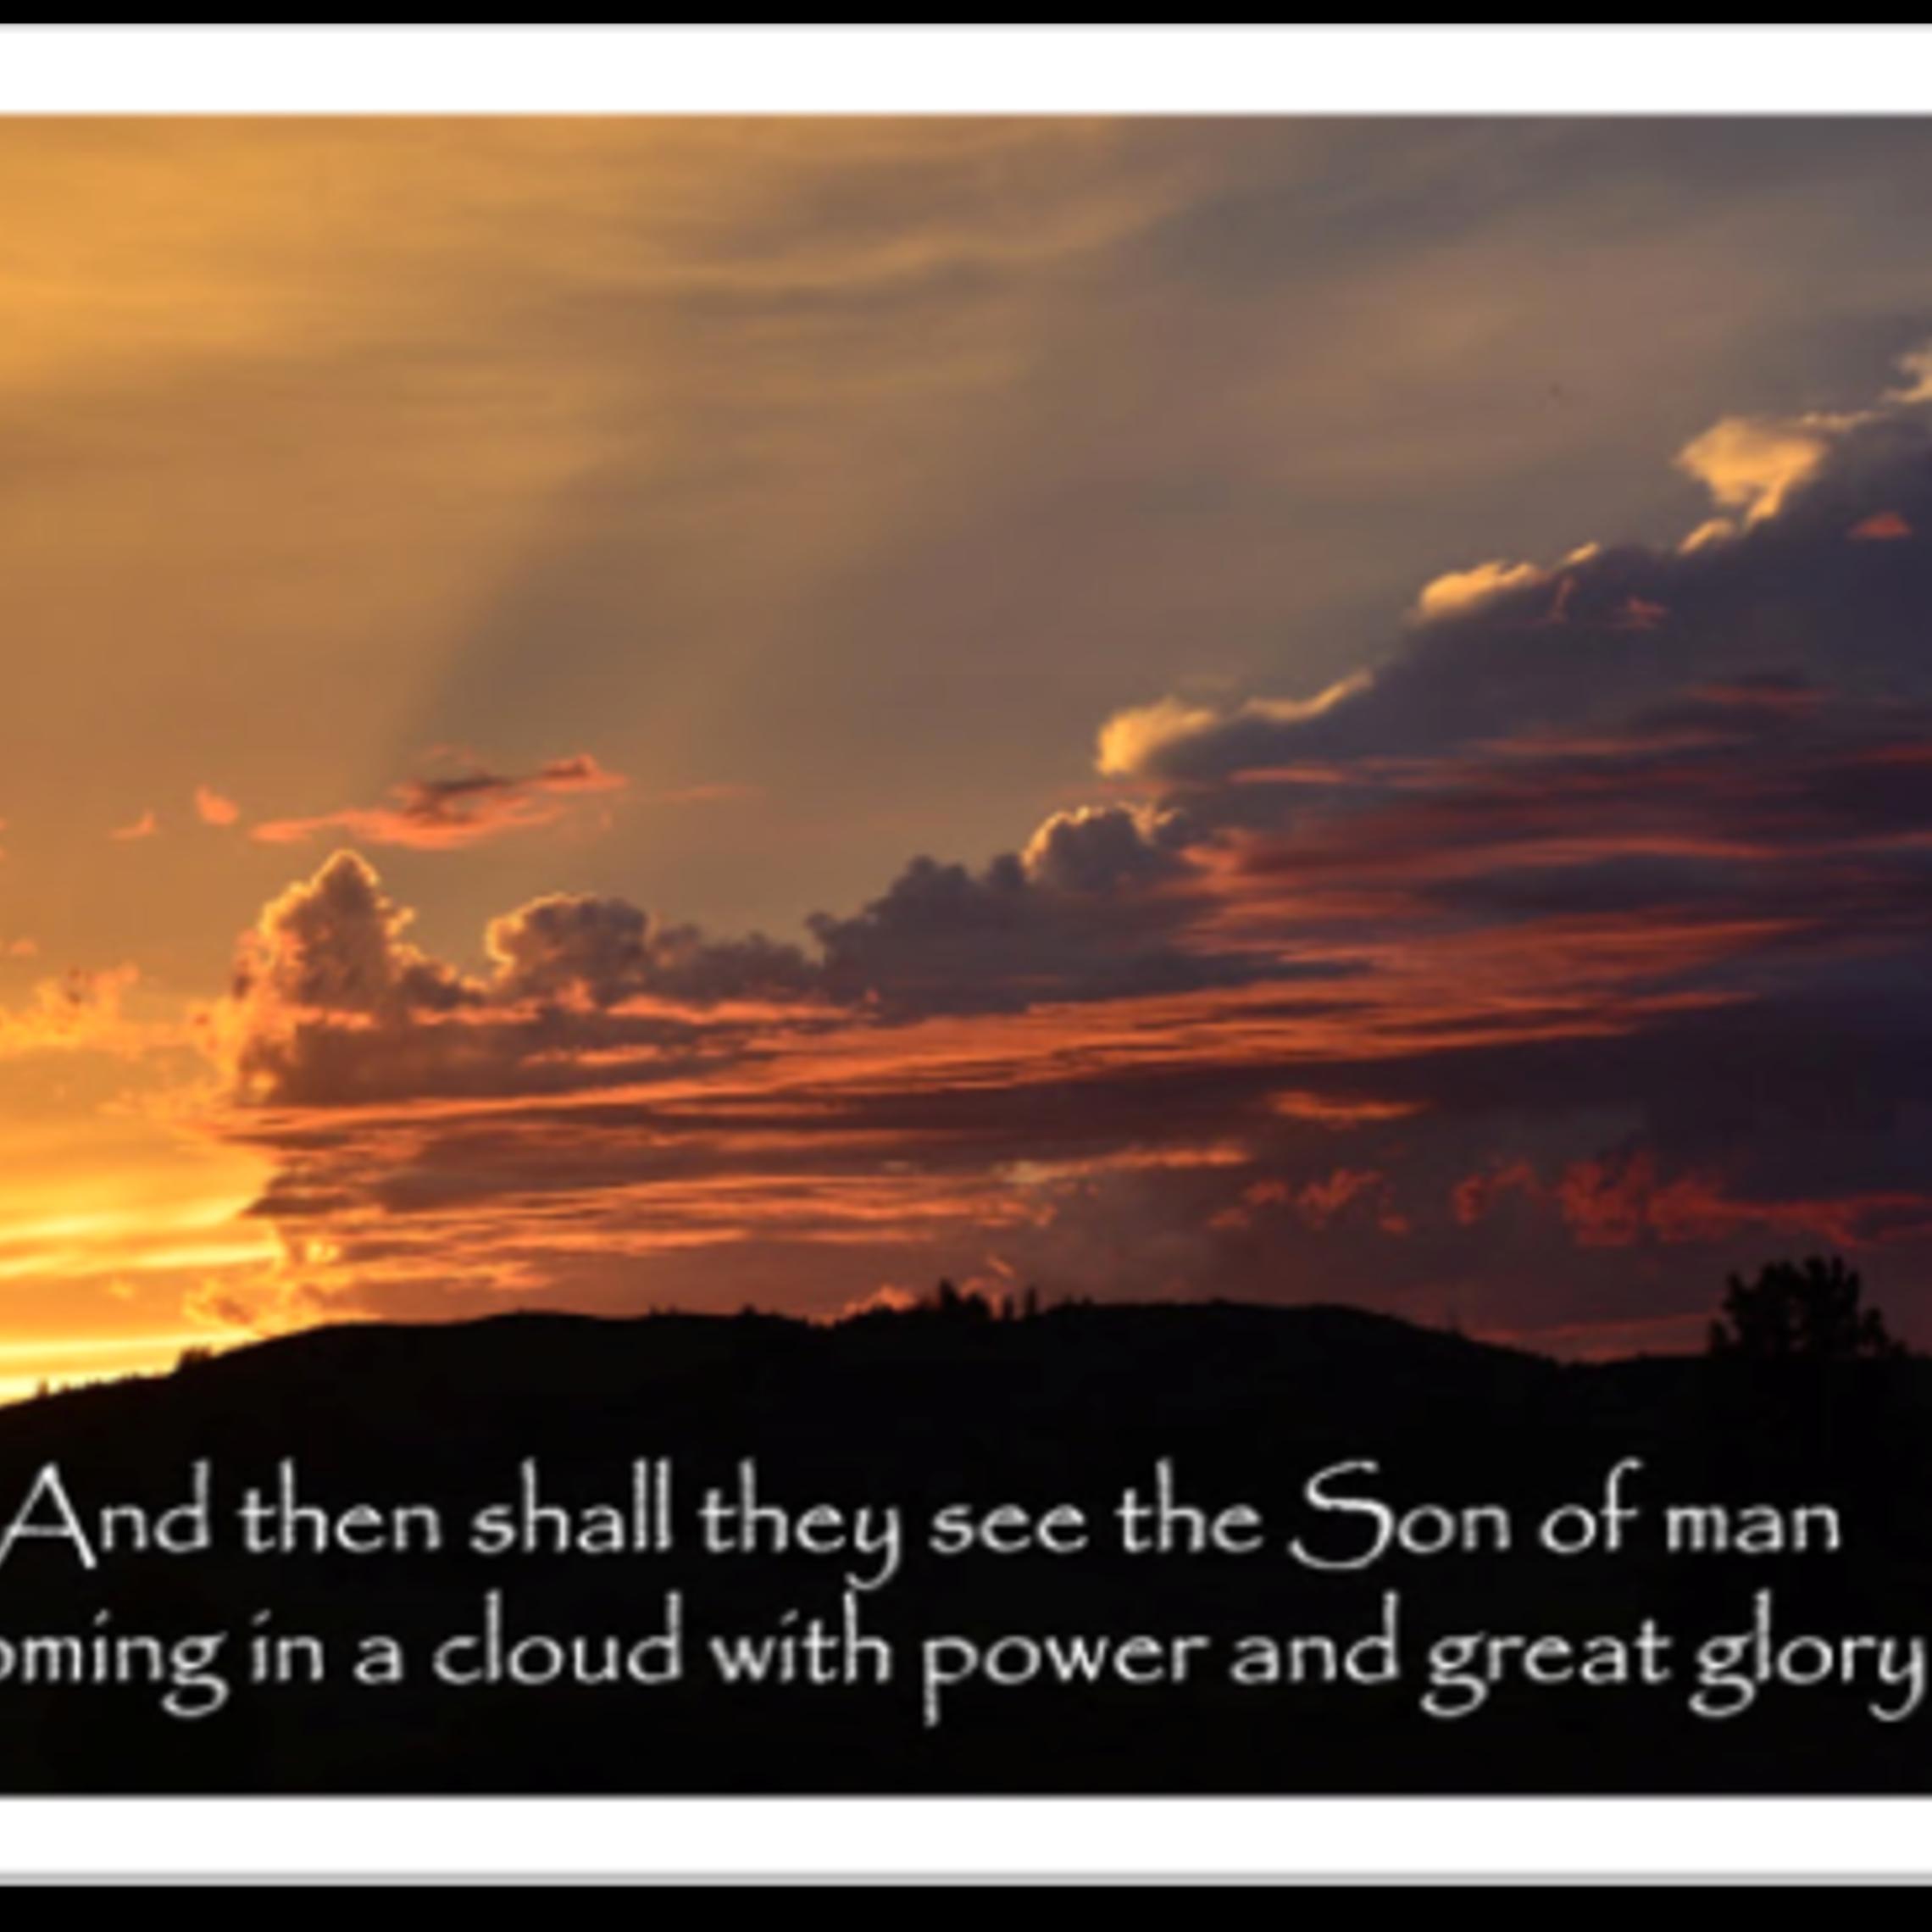 Great Glory